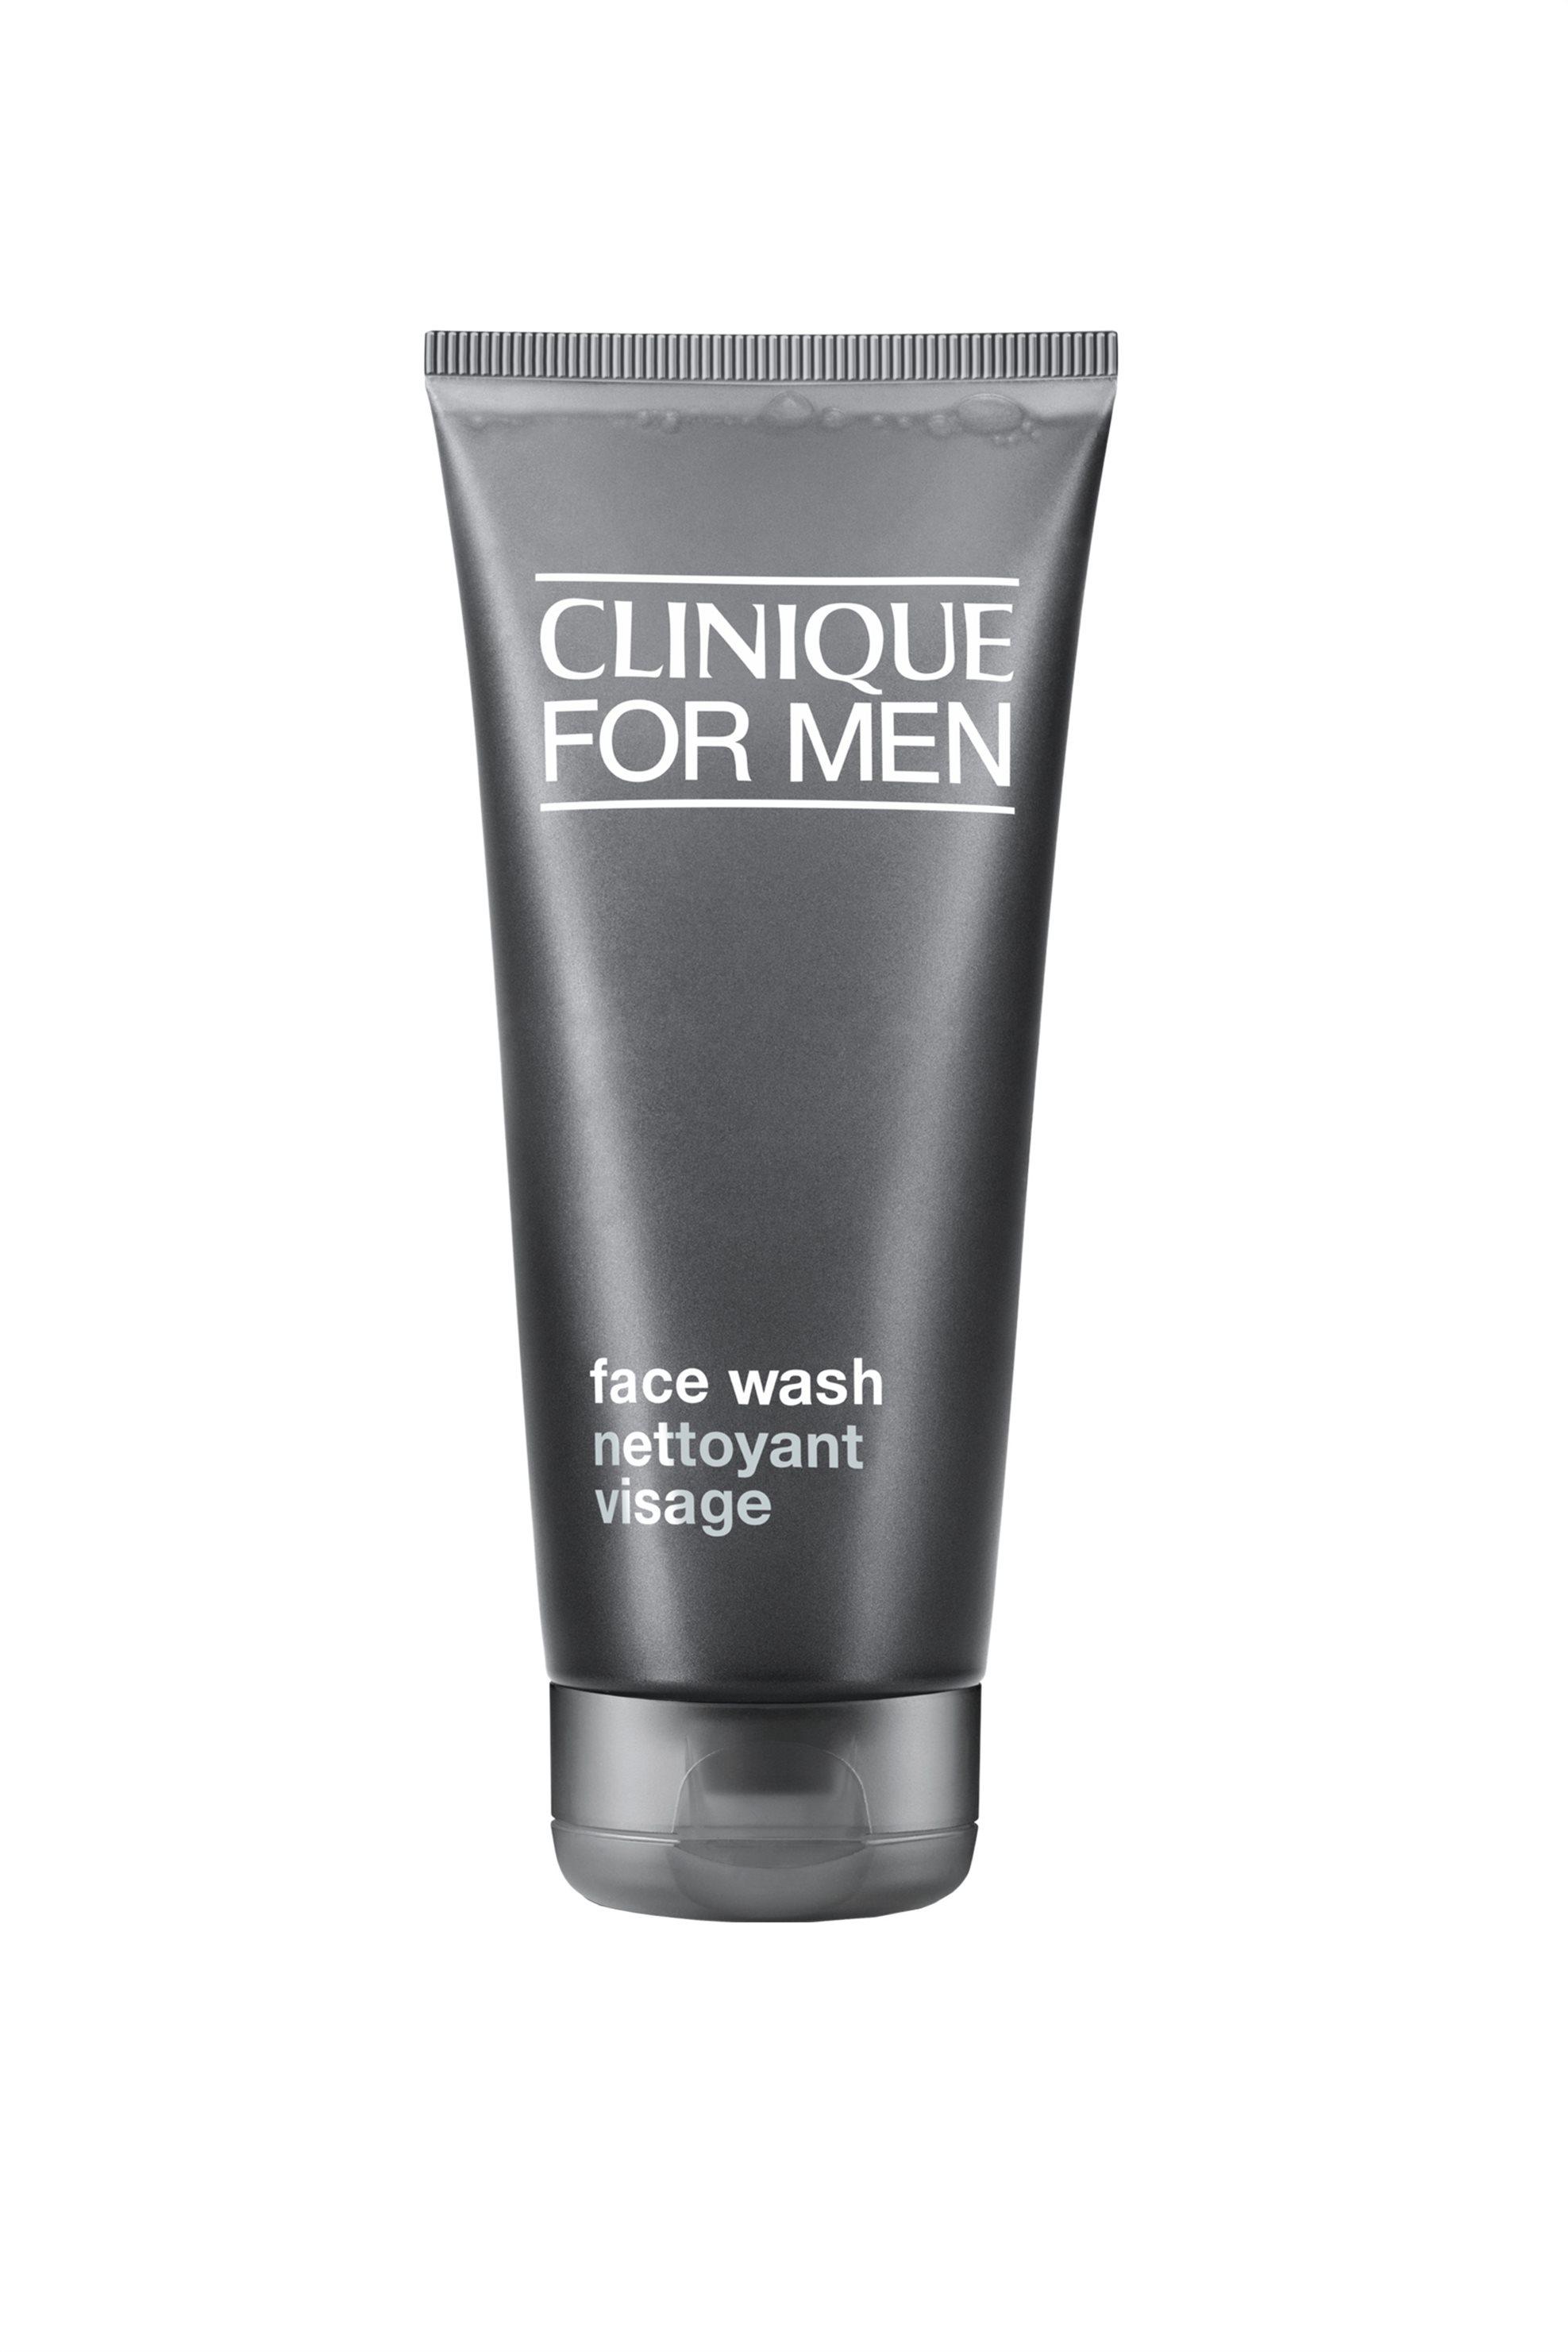 Clinique Clinique For Men™ Face Wash 200 ml - Z4KH010000 ομορφια   καλλυντικα επιλεκτικησ   ανδρική περιποίηση   περιποίηση προσώπου